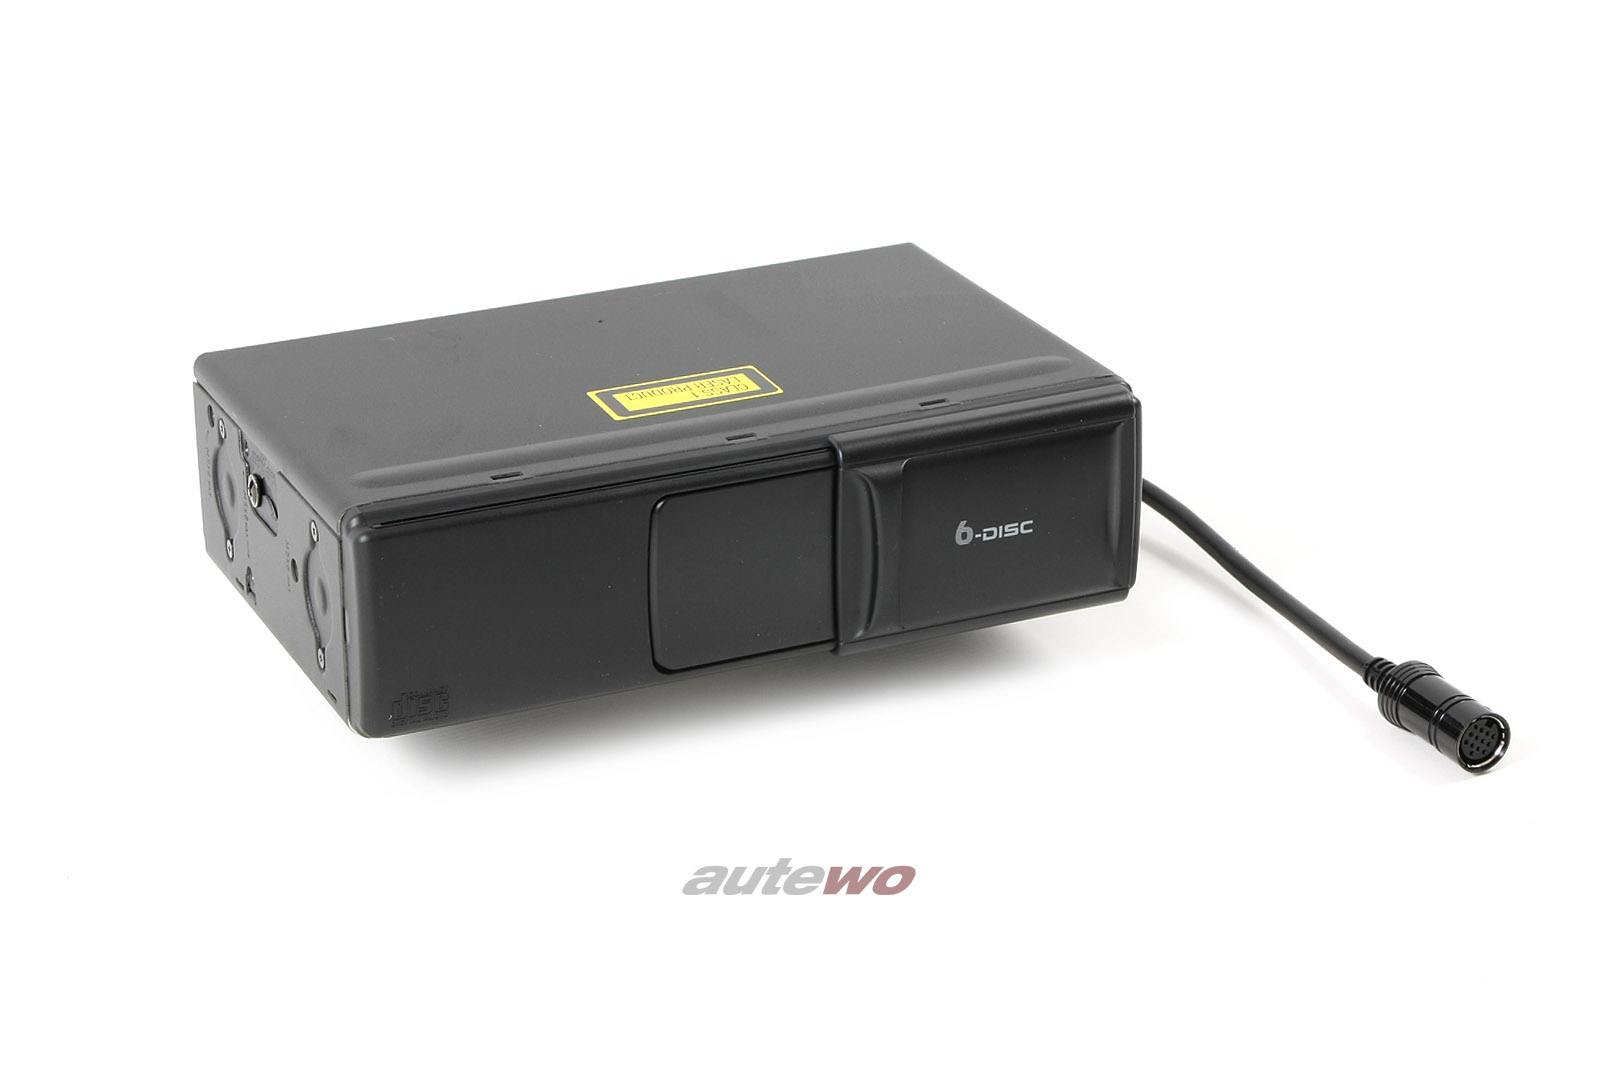 4B0057111A 4B0035111A NEU Audi A3 8L/A4 B5/A6 4B/A8 D2 6-fach CD-Wechsler